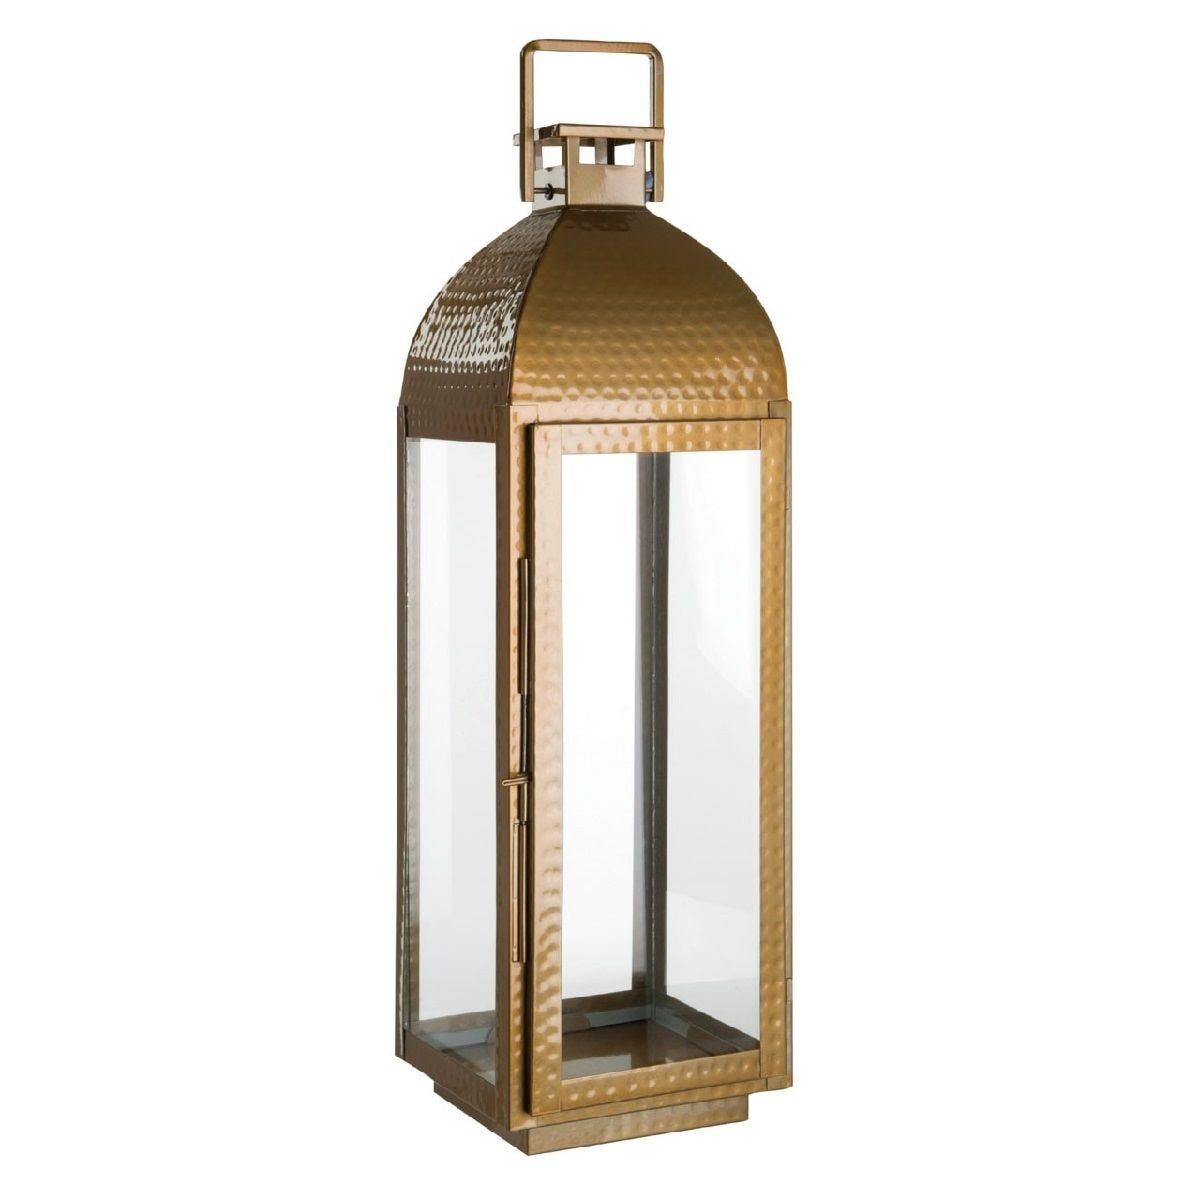 Premier Housewares Ravi Large Lantern in Stainless Steel/Glass - Brass Finish